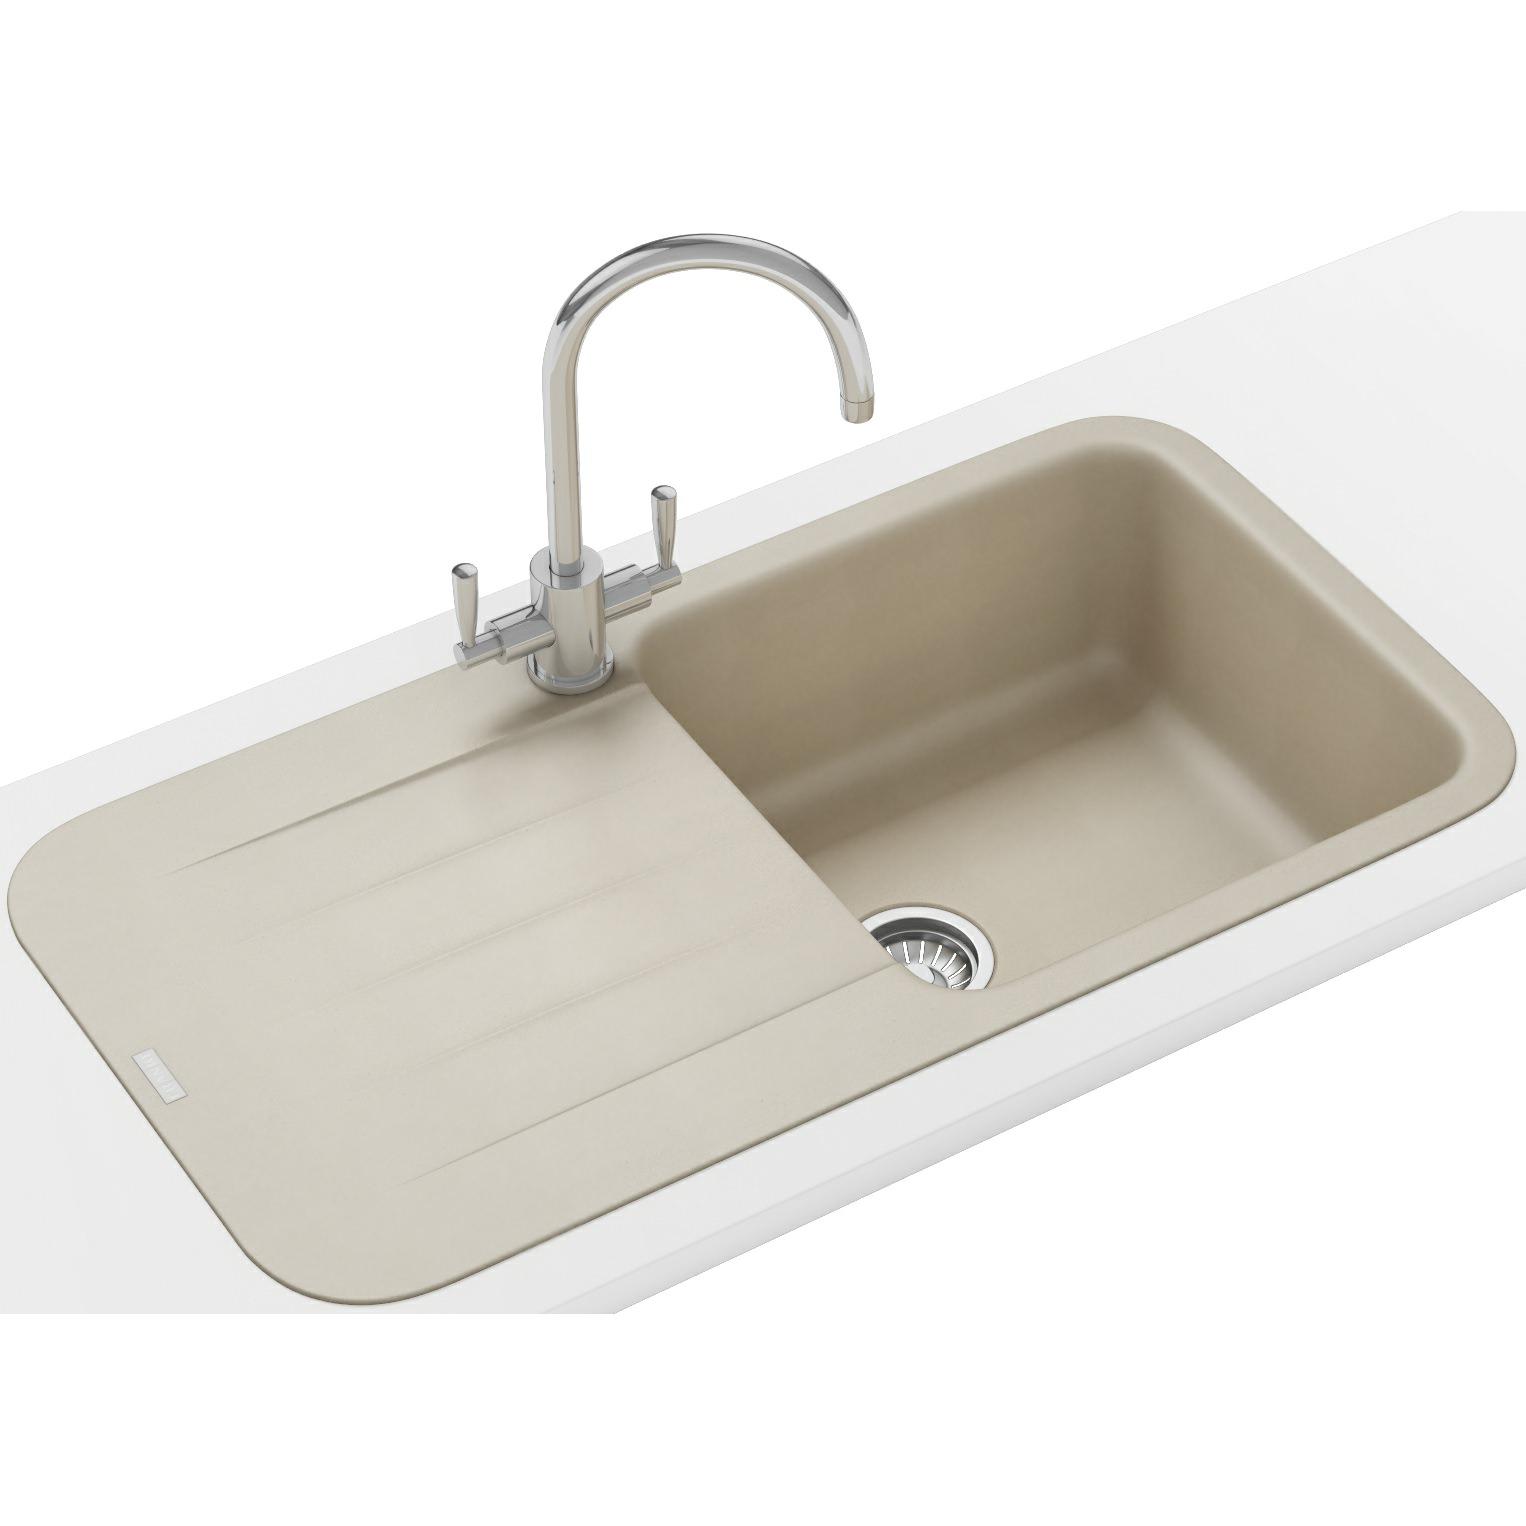 Franke Inset Sink : Franke Pebel DP PBG 611-970 Fragranite Coffee Inset Sink And Tap 114 ...